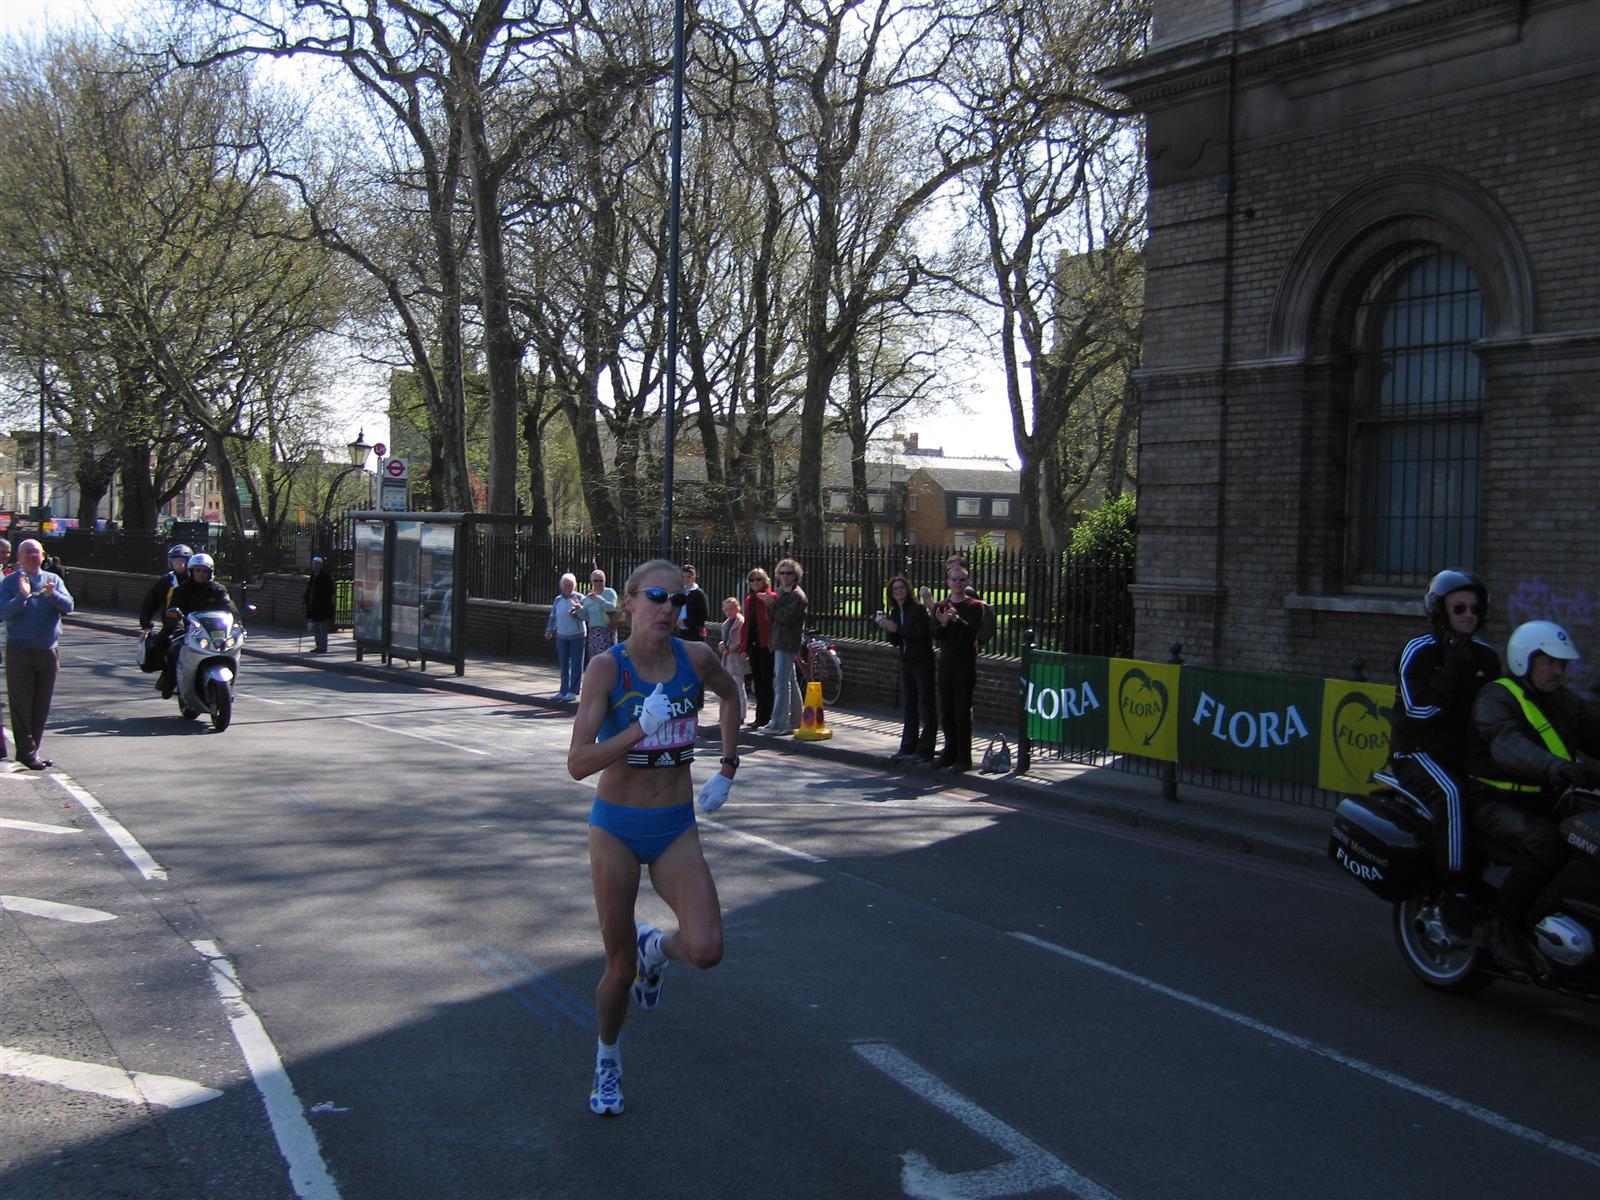 Paula Radcliffe At 2005 London Marathon